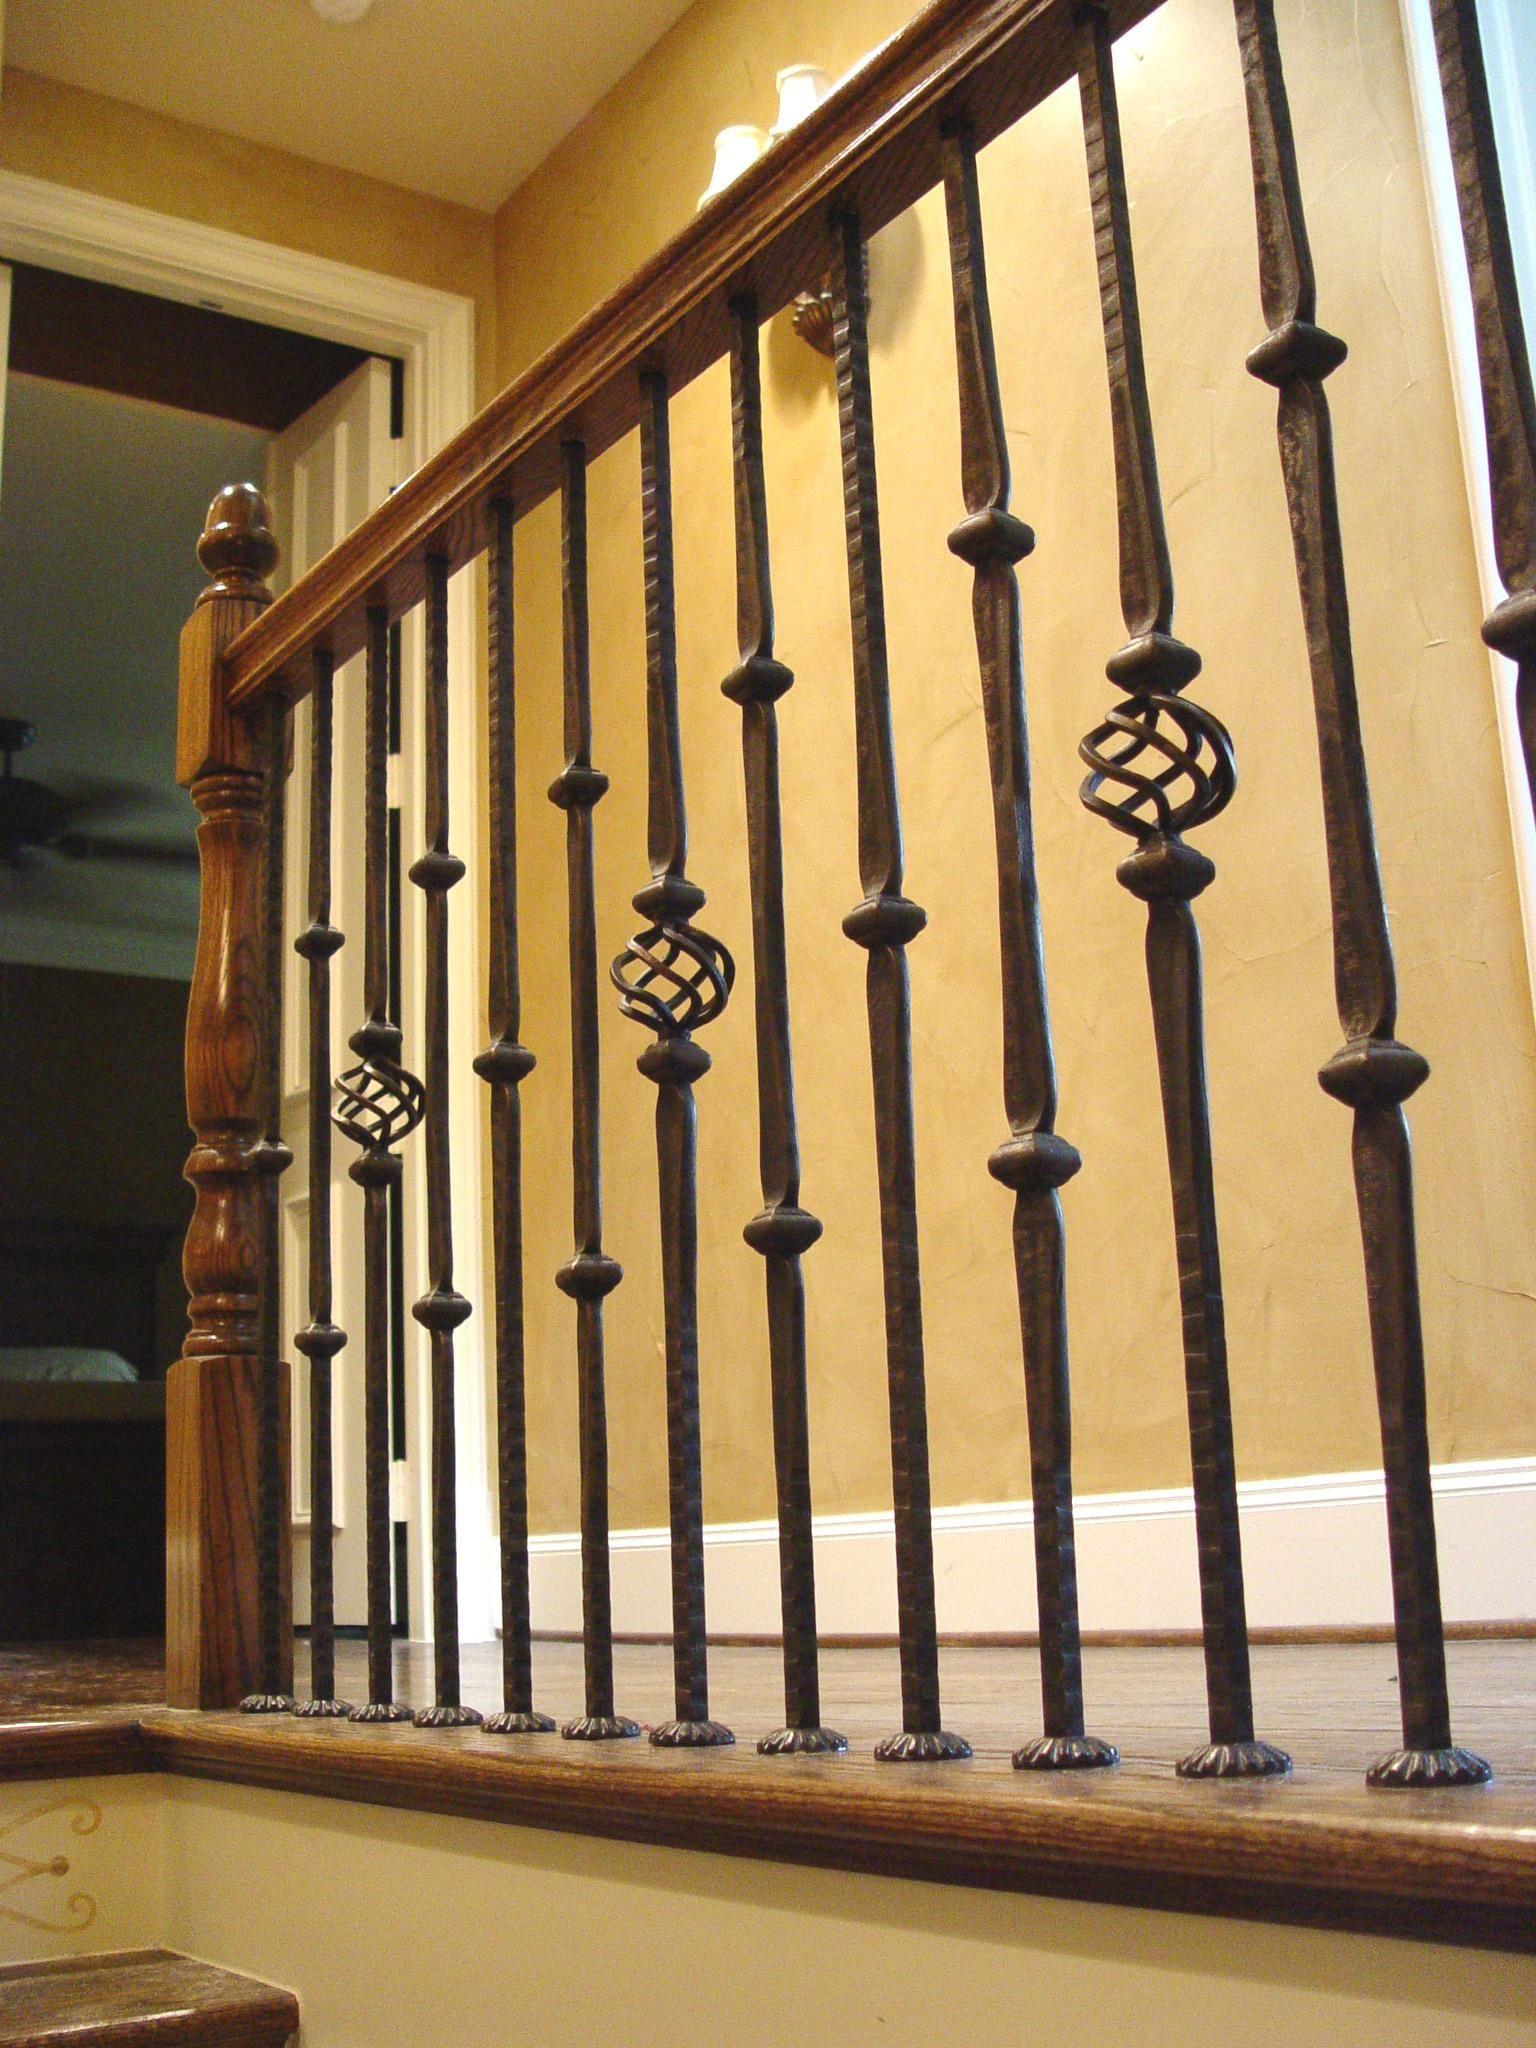 Iron Balusters Patterns Trinity Stairs Stair Railing Design | Iron Handrails Near Me | Iron Balusters | Gates | Fence | Stair Parts | Iron Stair Railings